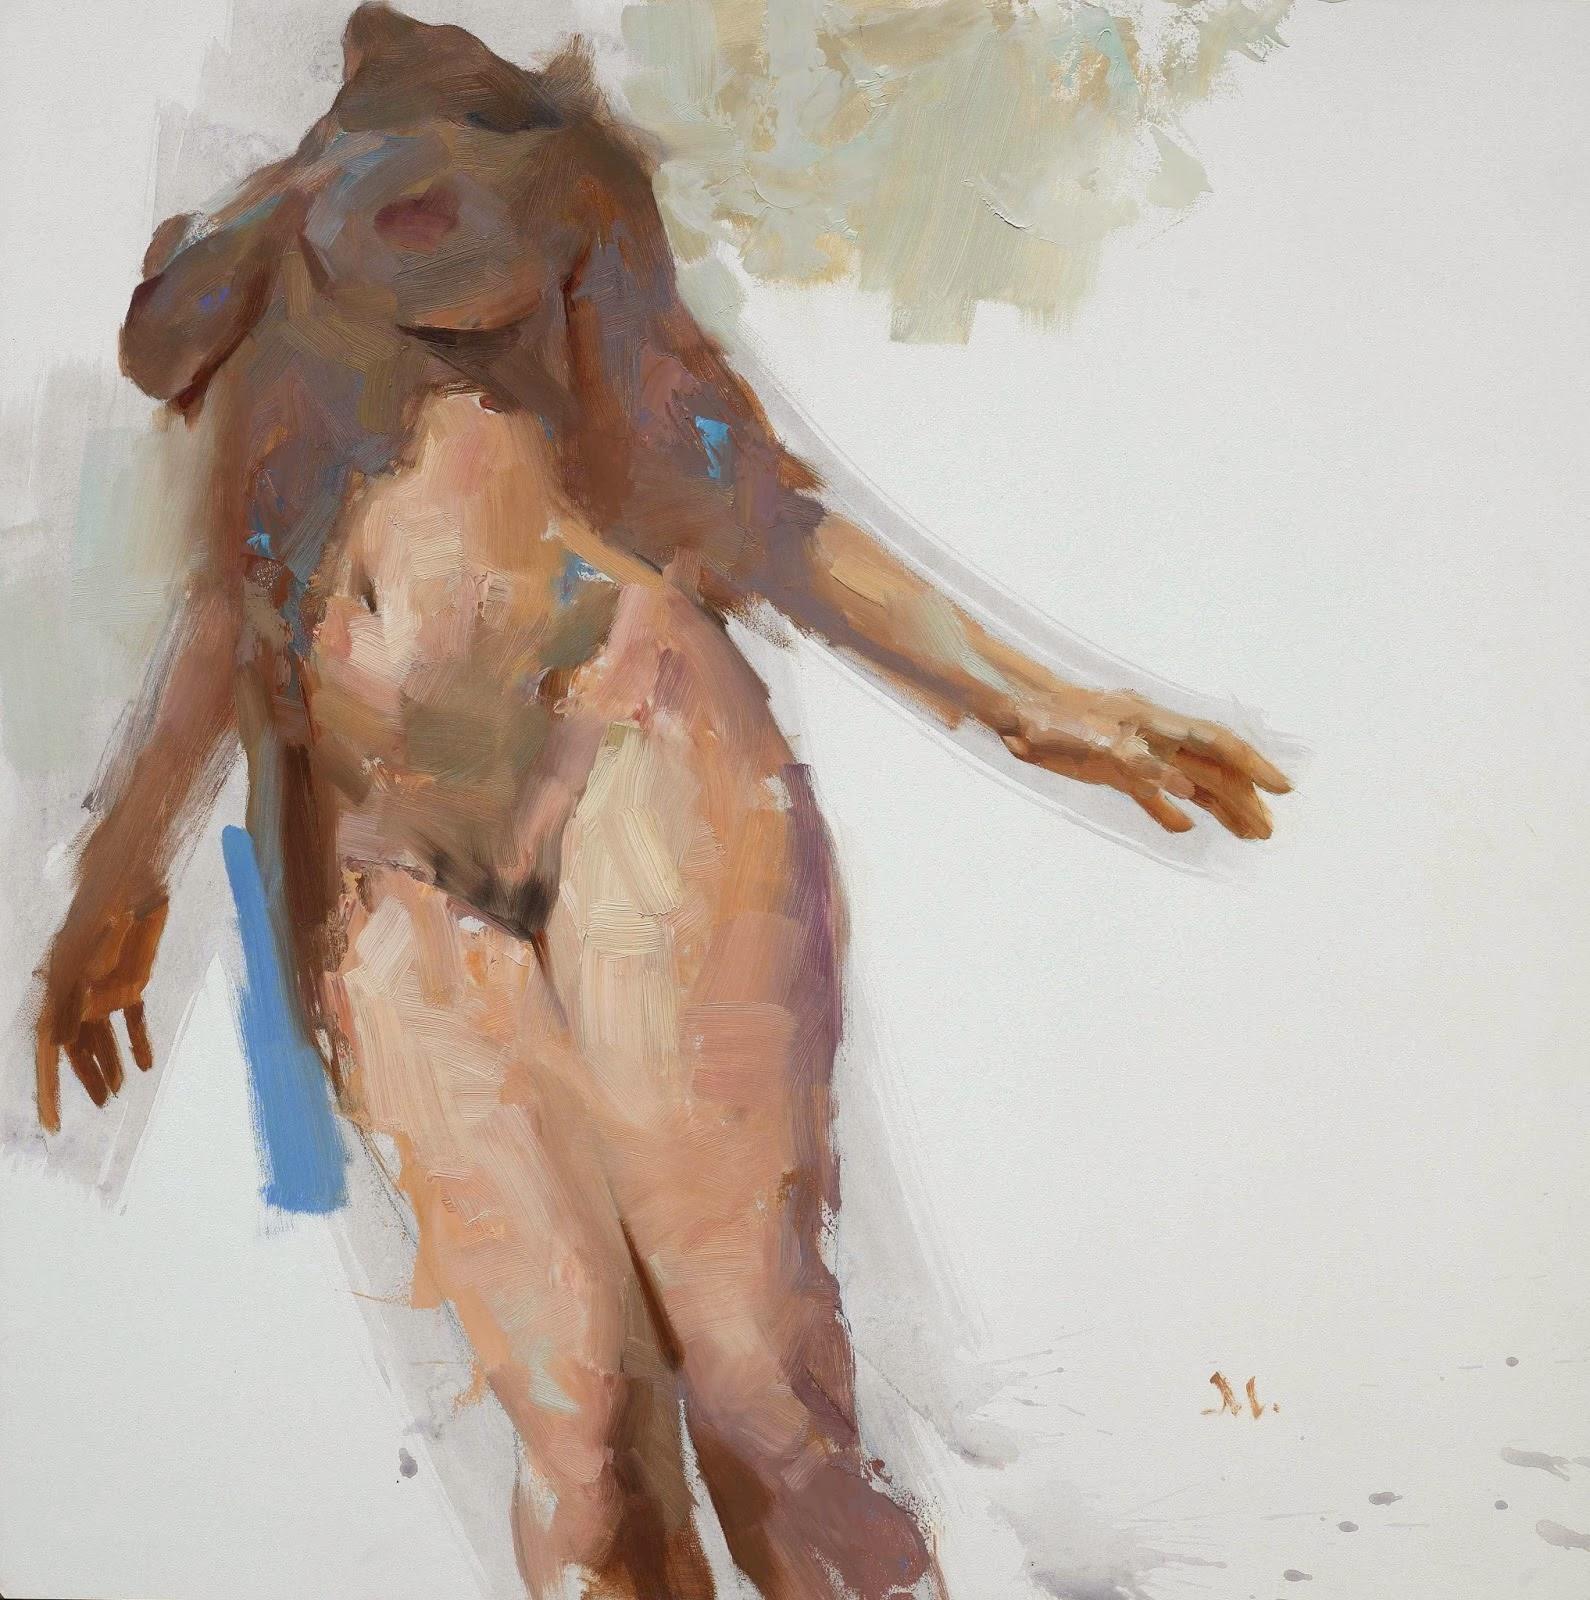 amature erotic artist